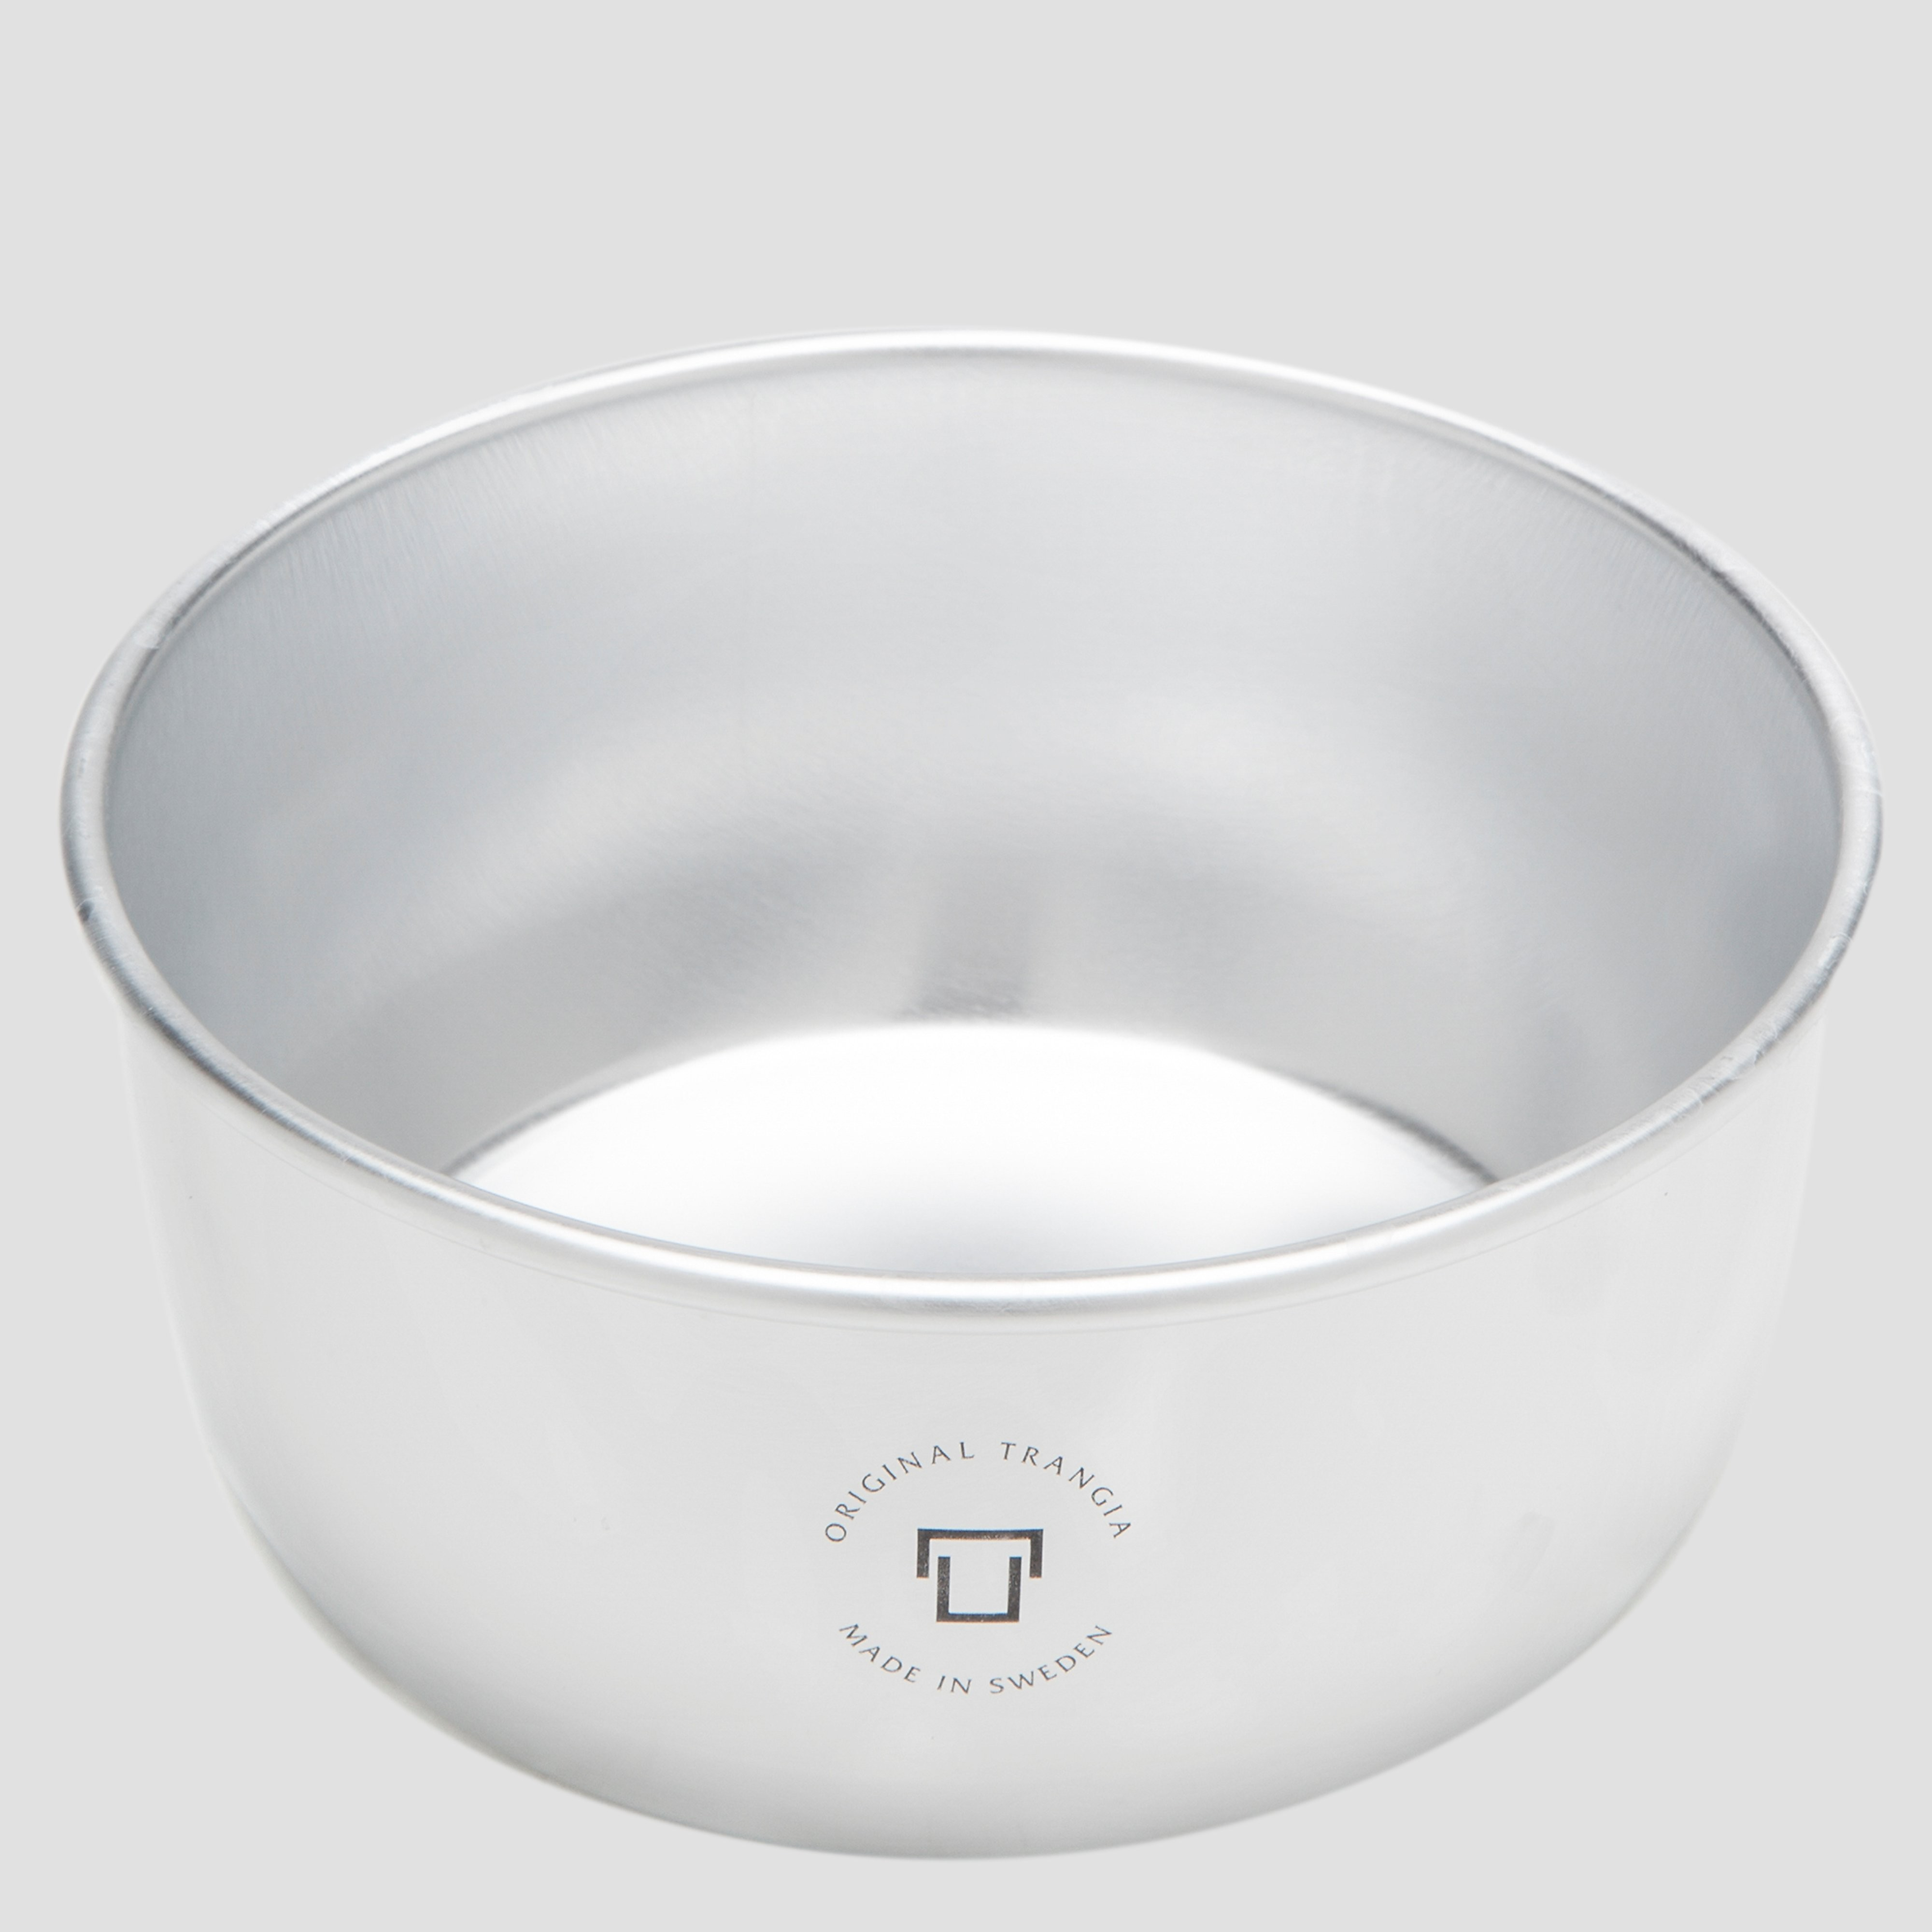 Trangia 27 Series 1.0 Litre Outer Aluminium Saucepan